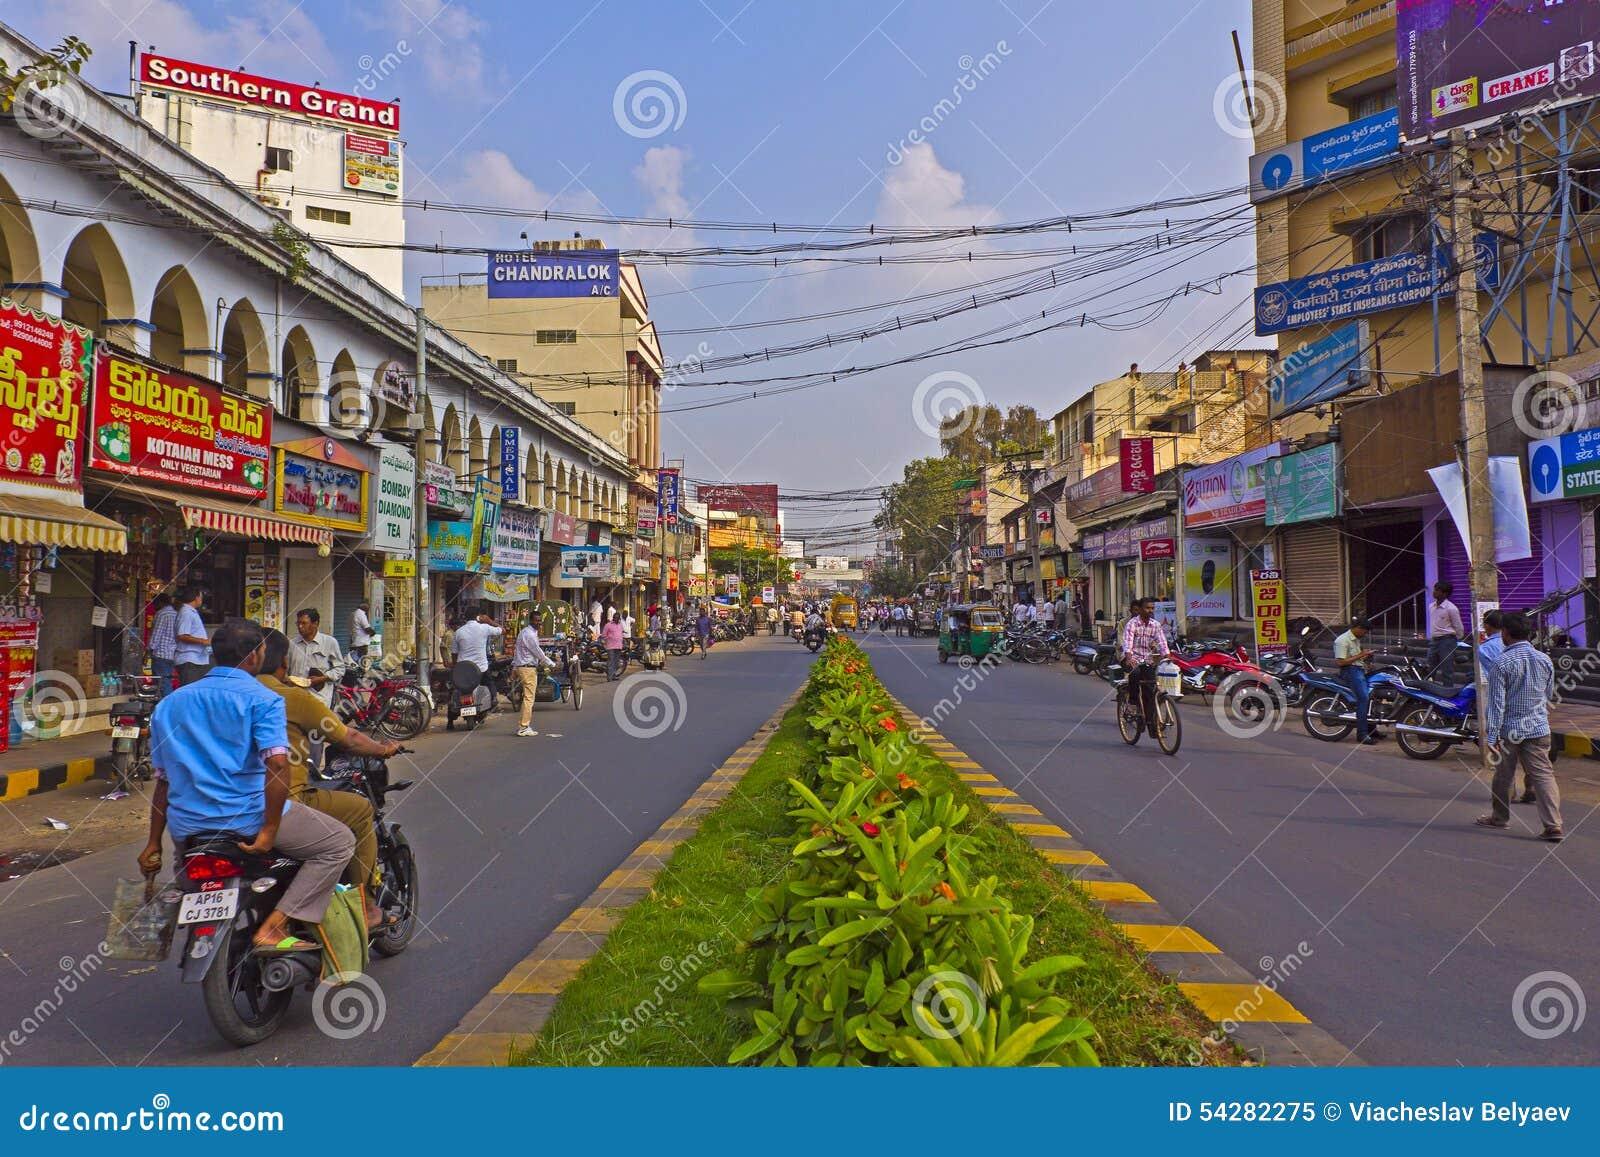 Vijayawada editorial image  Image of pedestrians, walkers